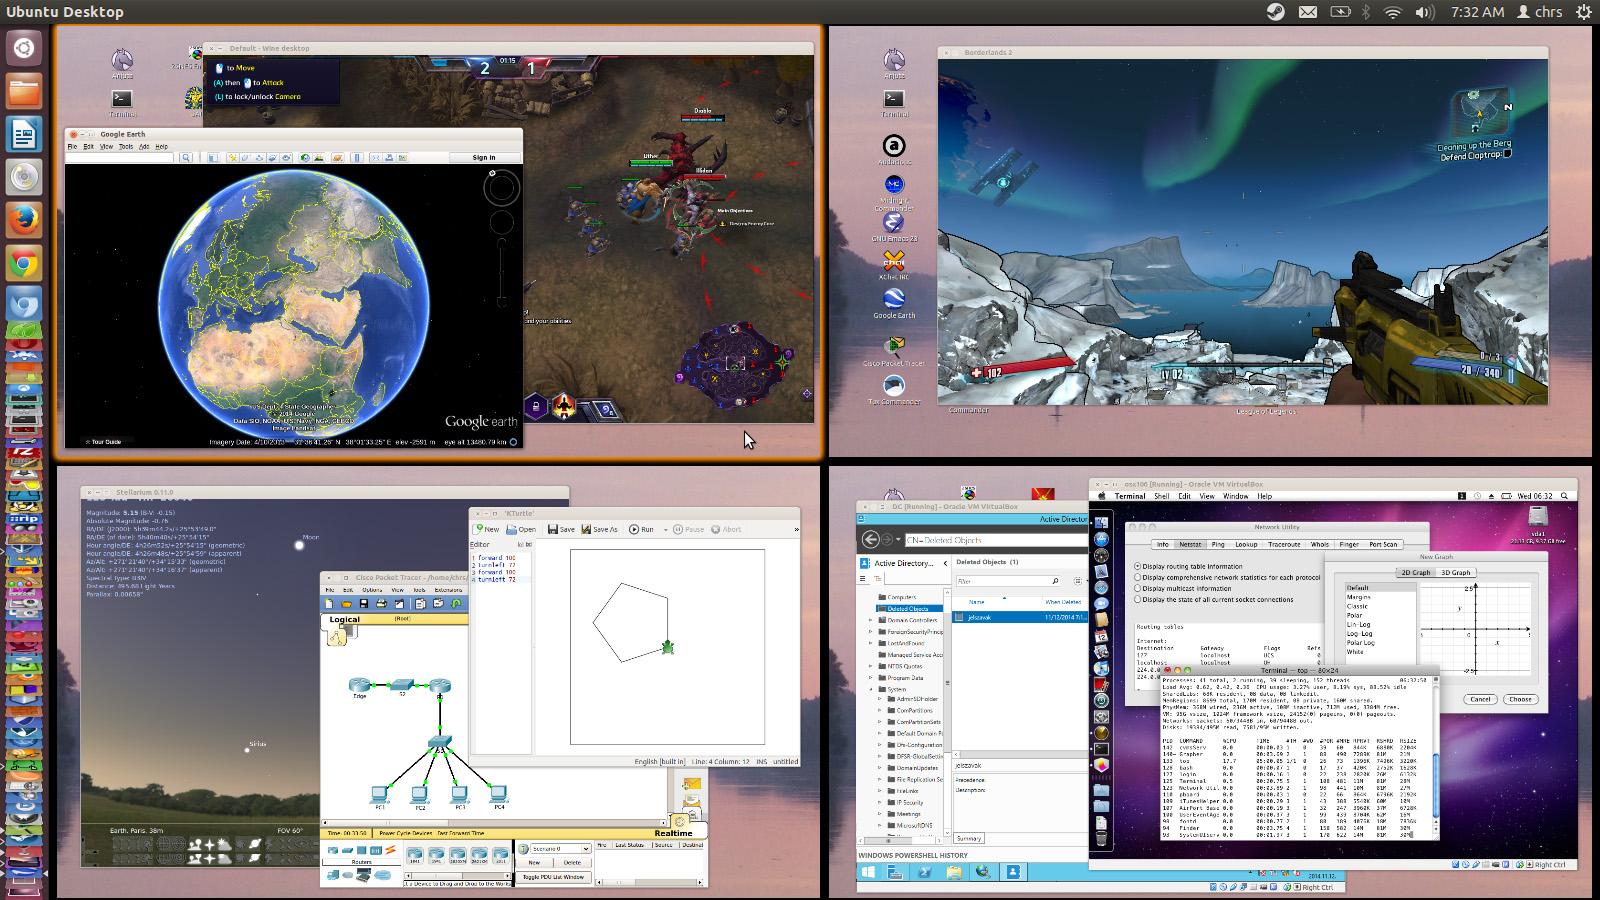 ubuntu_linux_multitasking_2.jpg